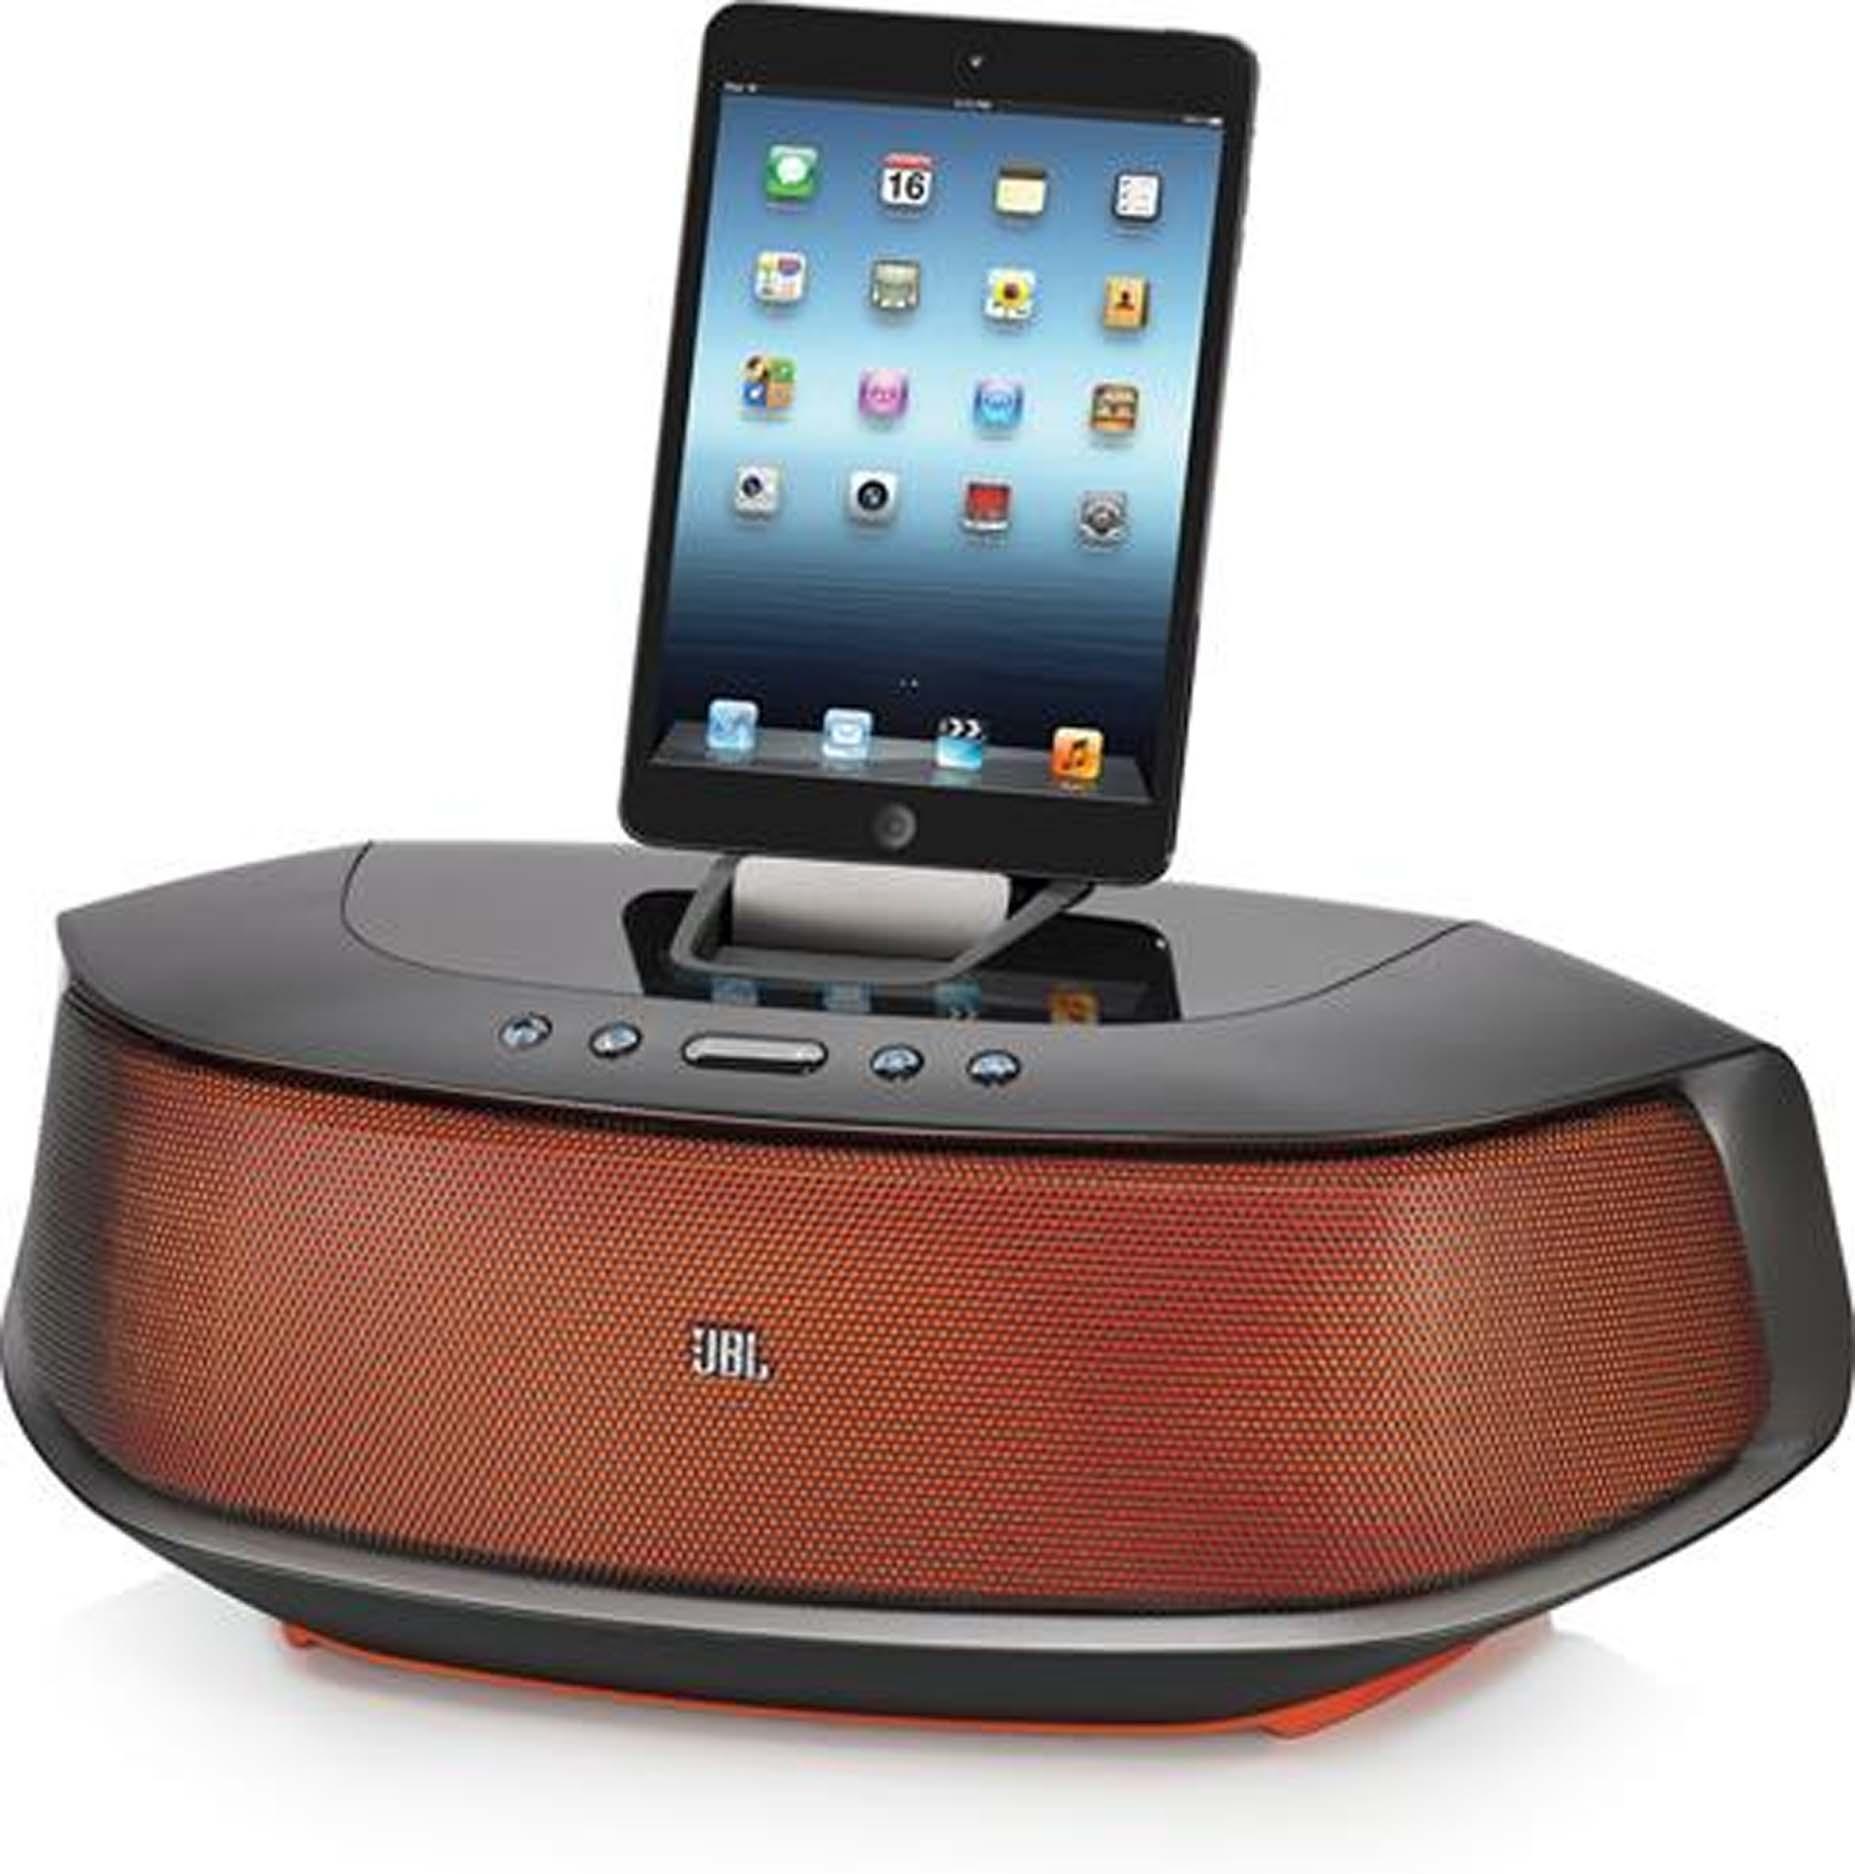 harga-jbl-on-beat-rumble-wireless-speake